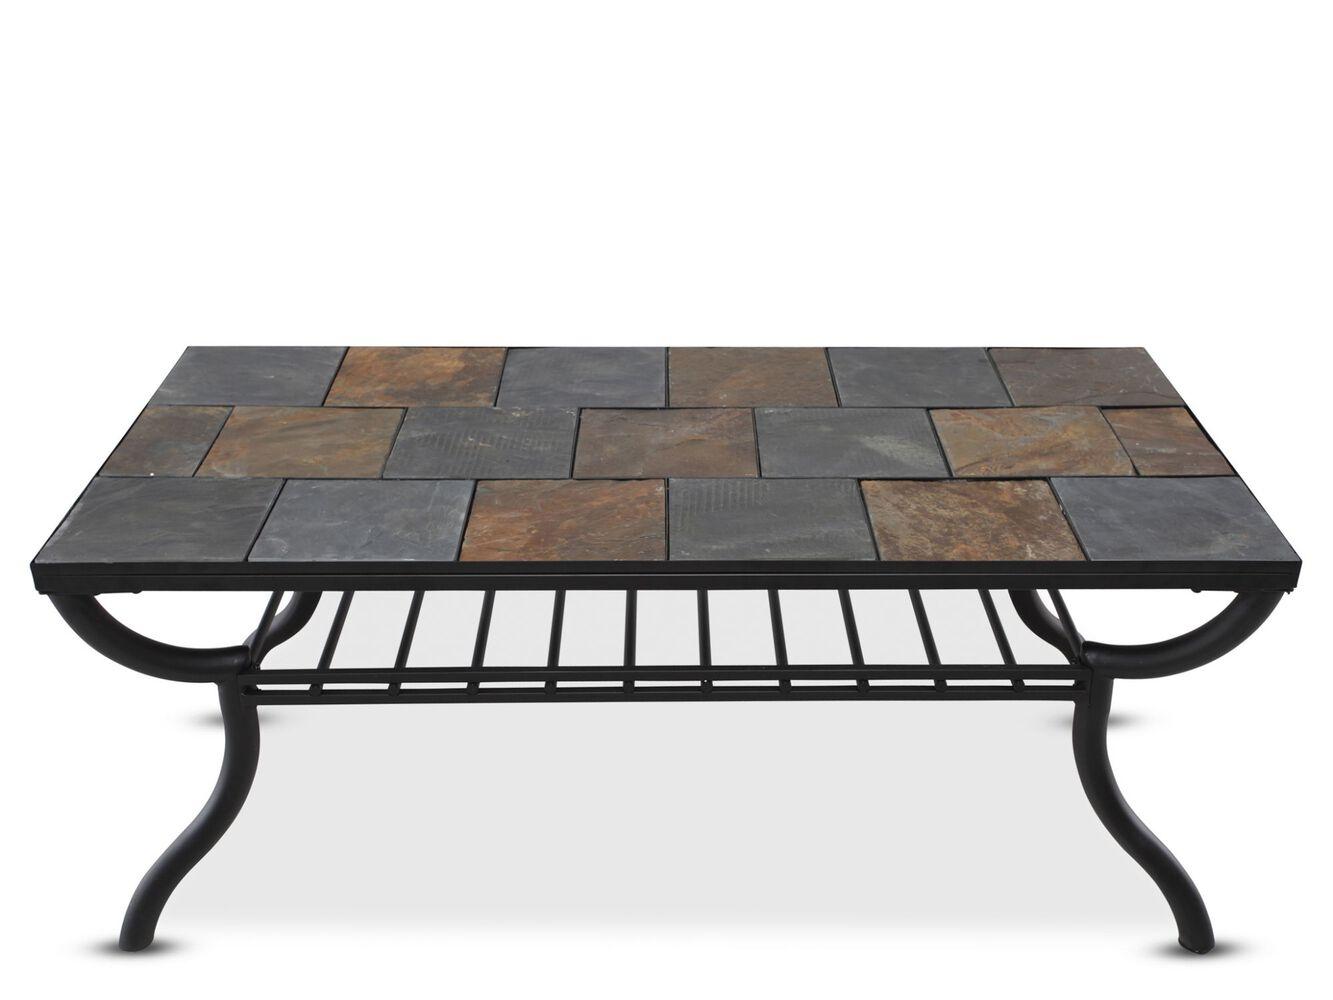 Brilliant Ashley Antigo Coffee Table Rascalartsnyc Beatyapartments Chair Design Images Beatyapartmentscom